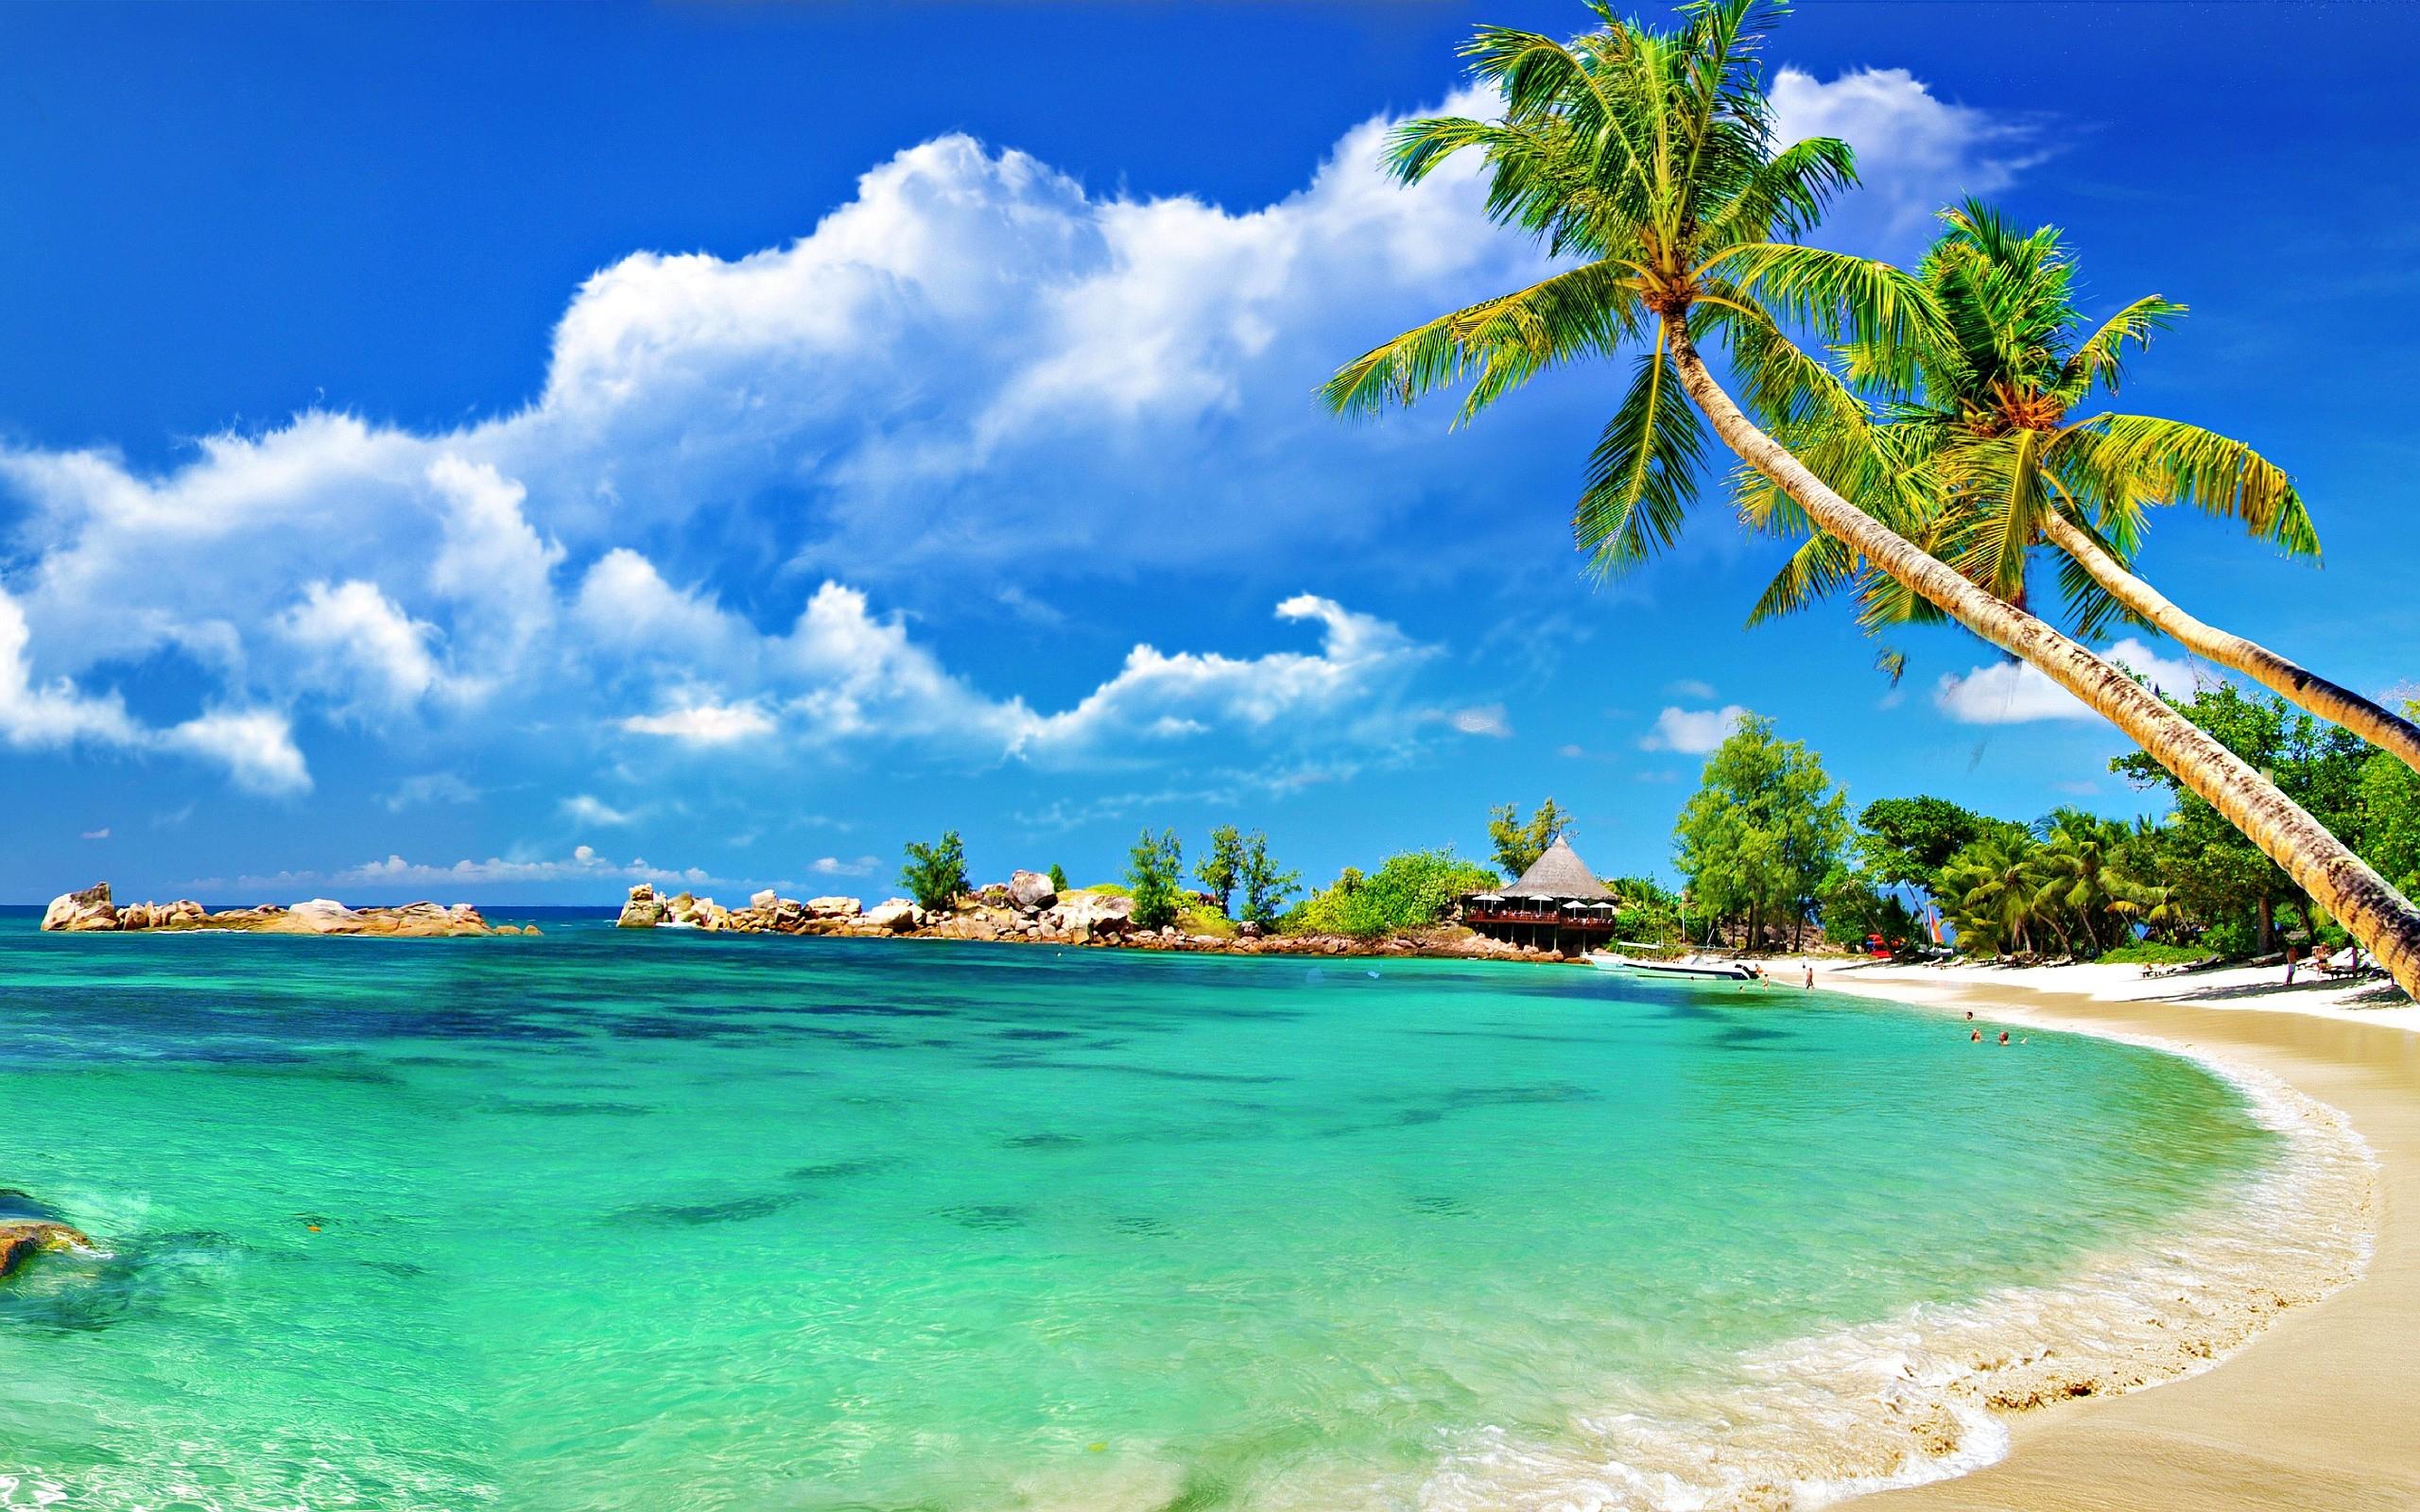 hd beach desktop backgrounds (61+ images)